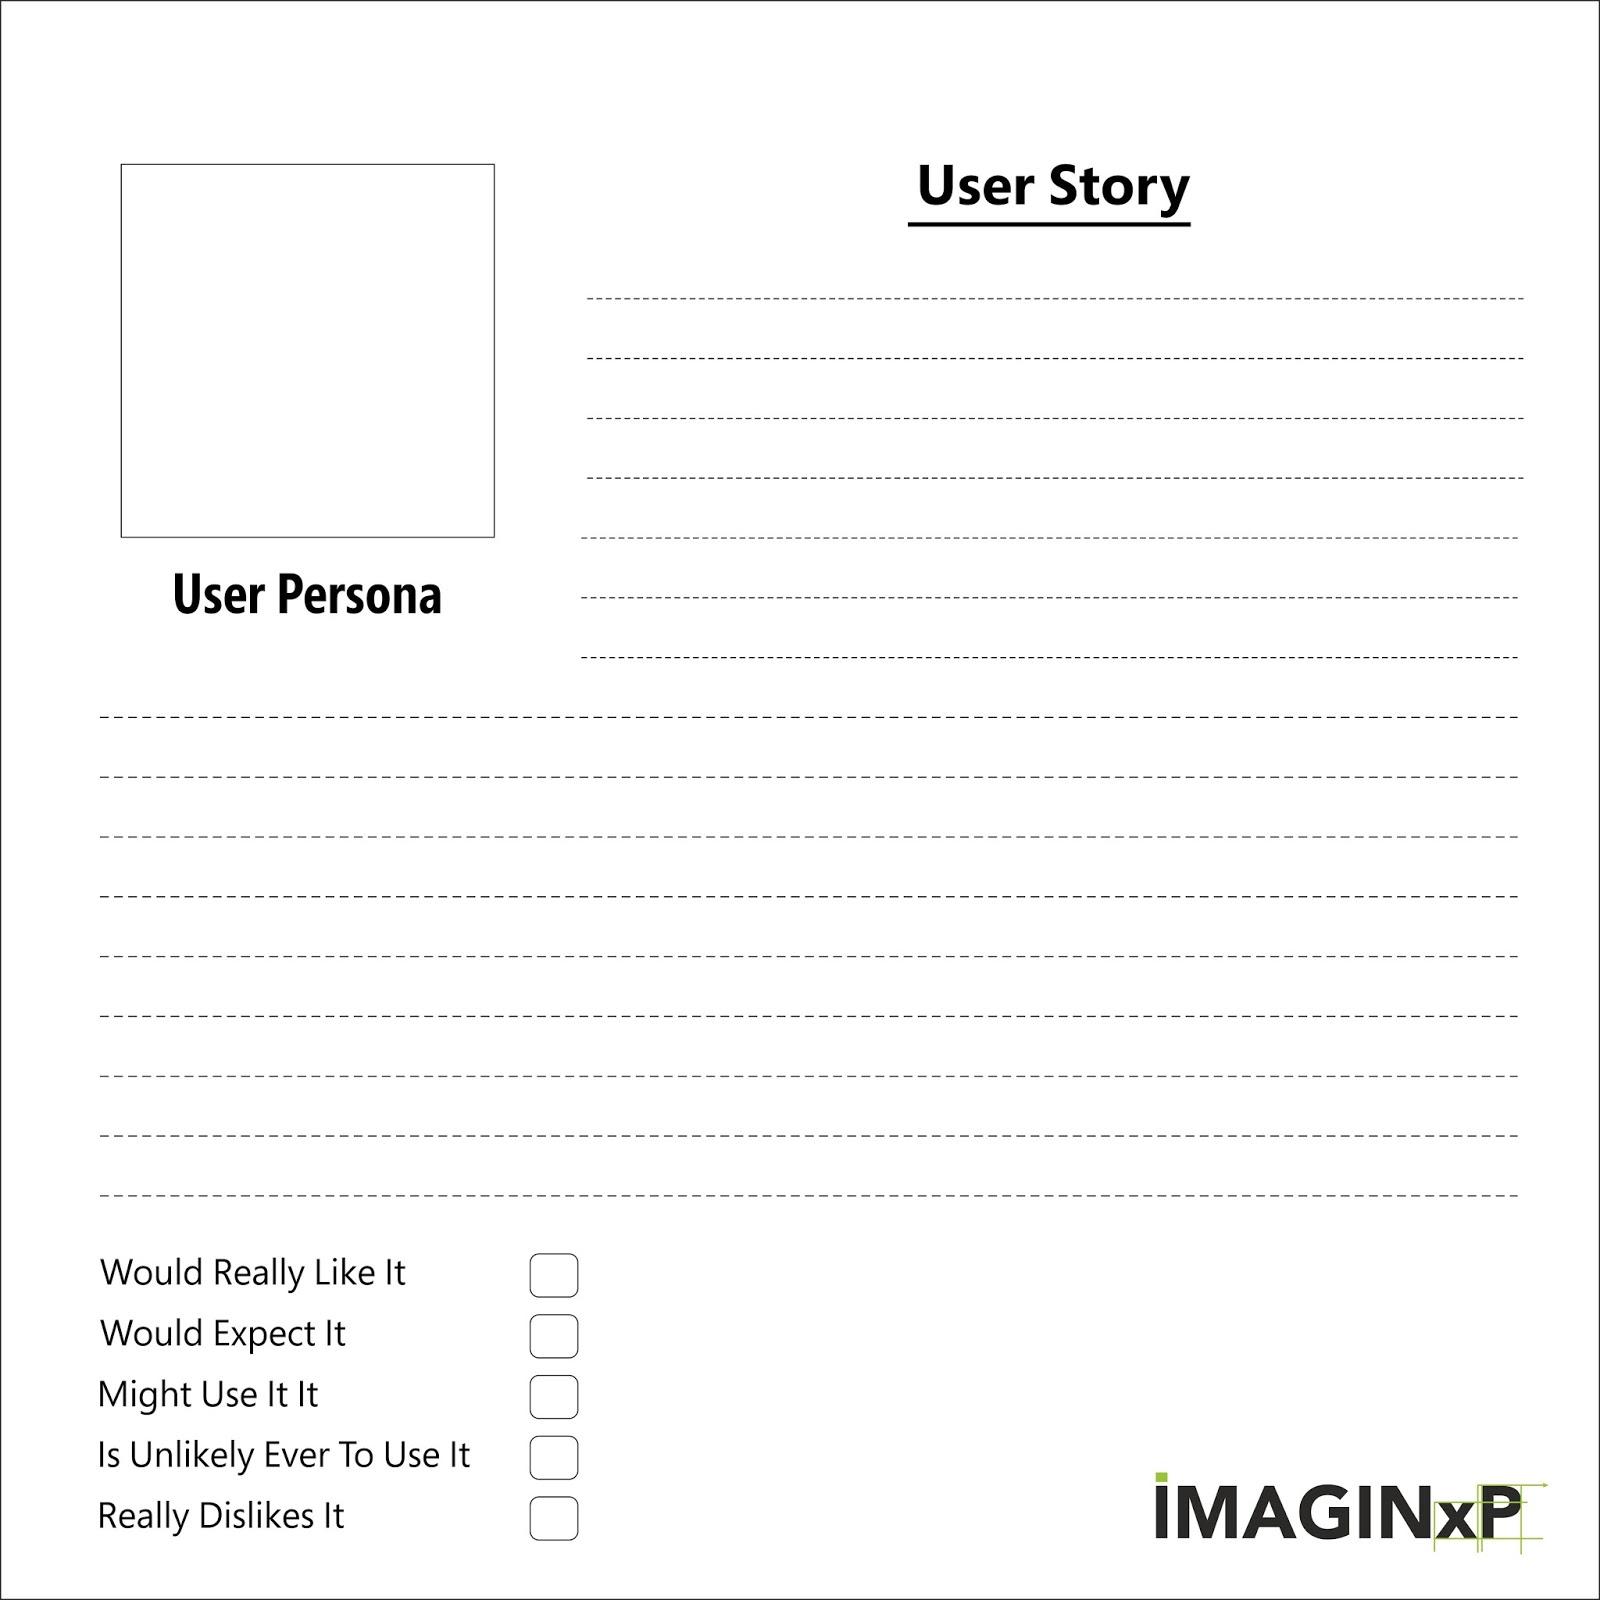 imaginxp beginner 39 s guide to user stories. Black Bedroom Furniture Sets. Home Design Ideas